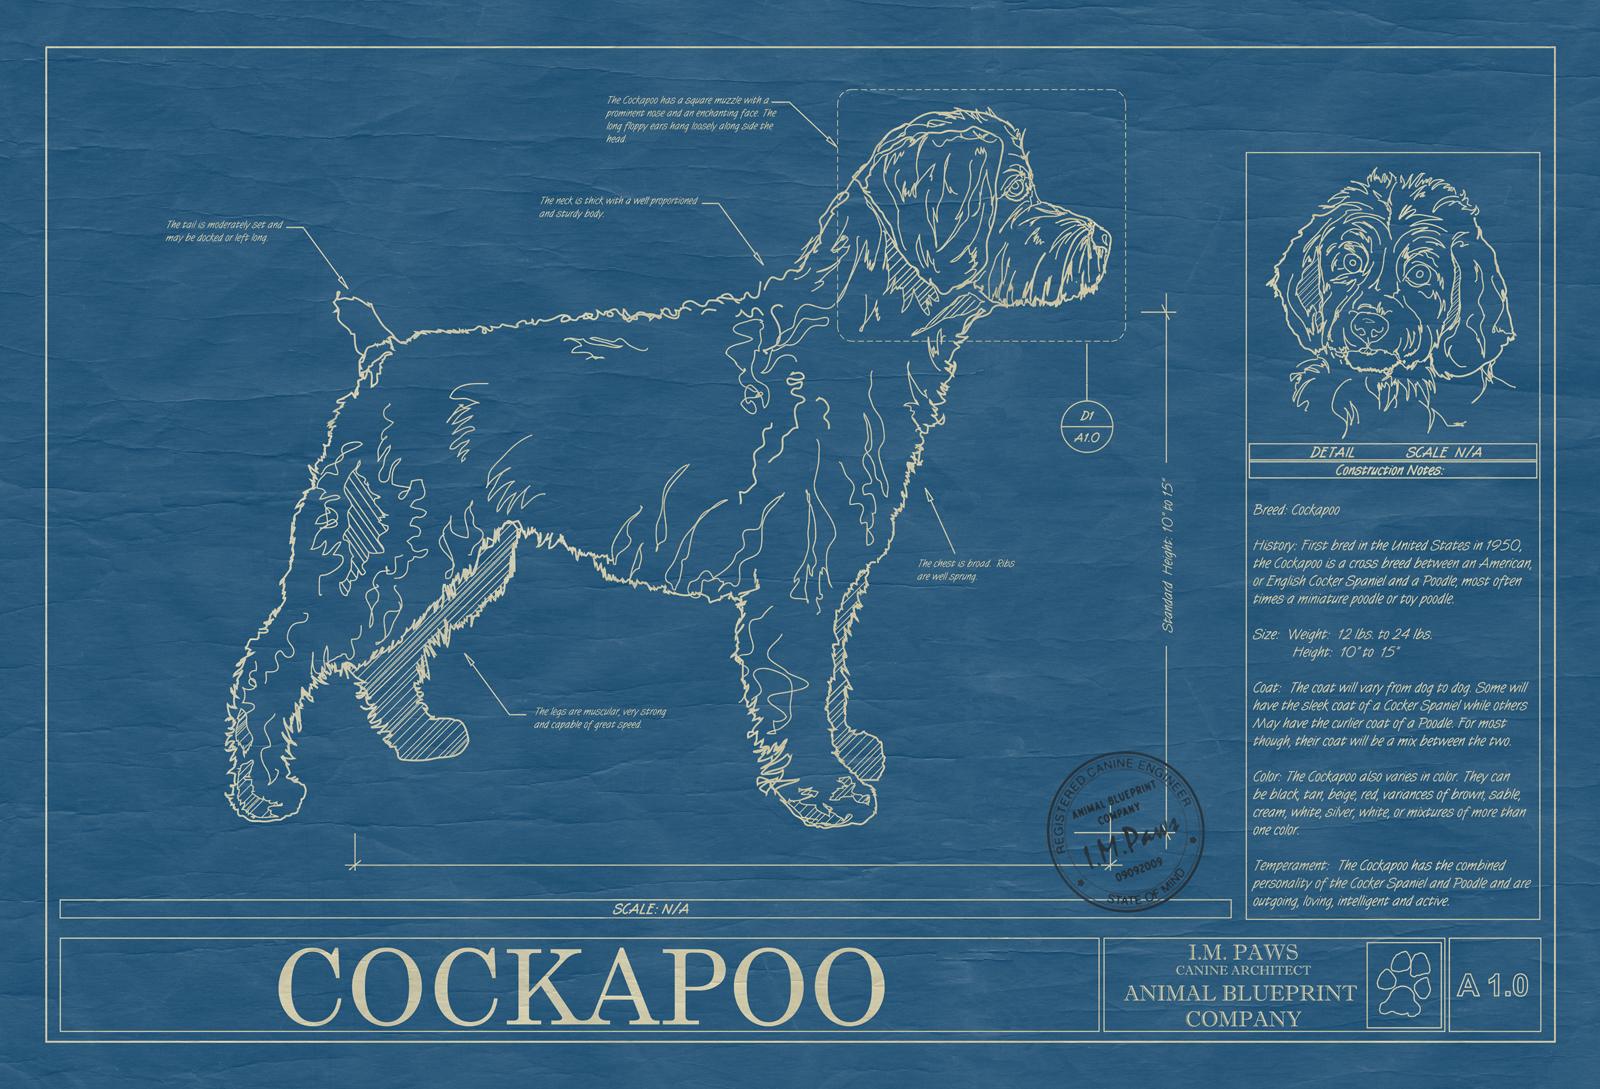 Cockapoo animal blueprint company cockapoo dog blueprint malvernweather Gallery